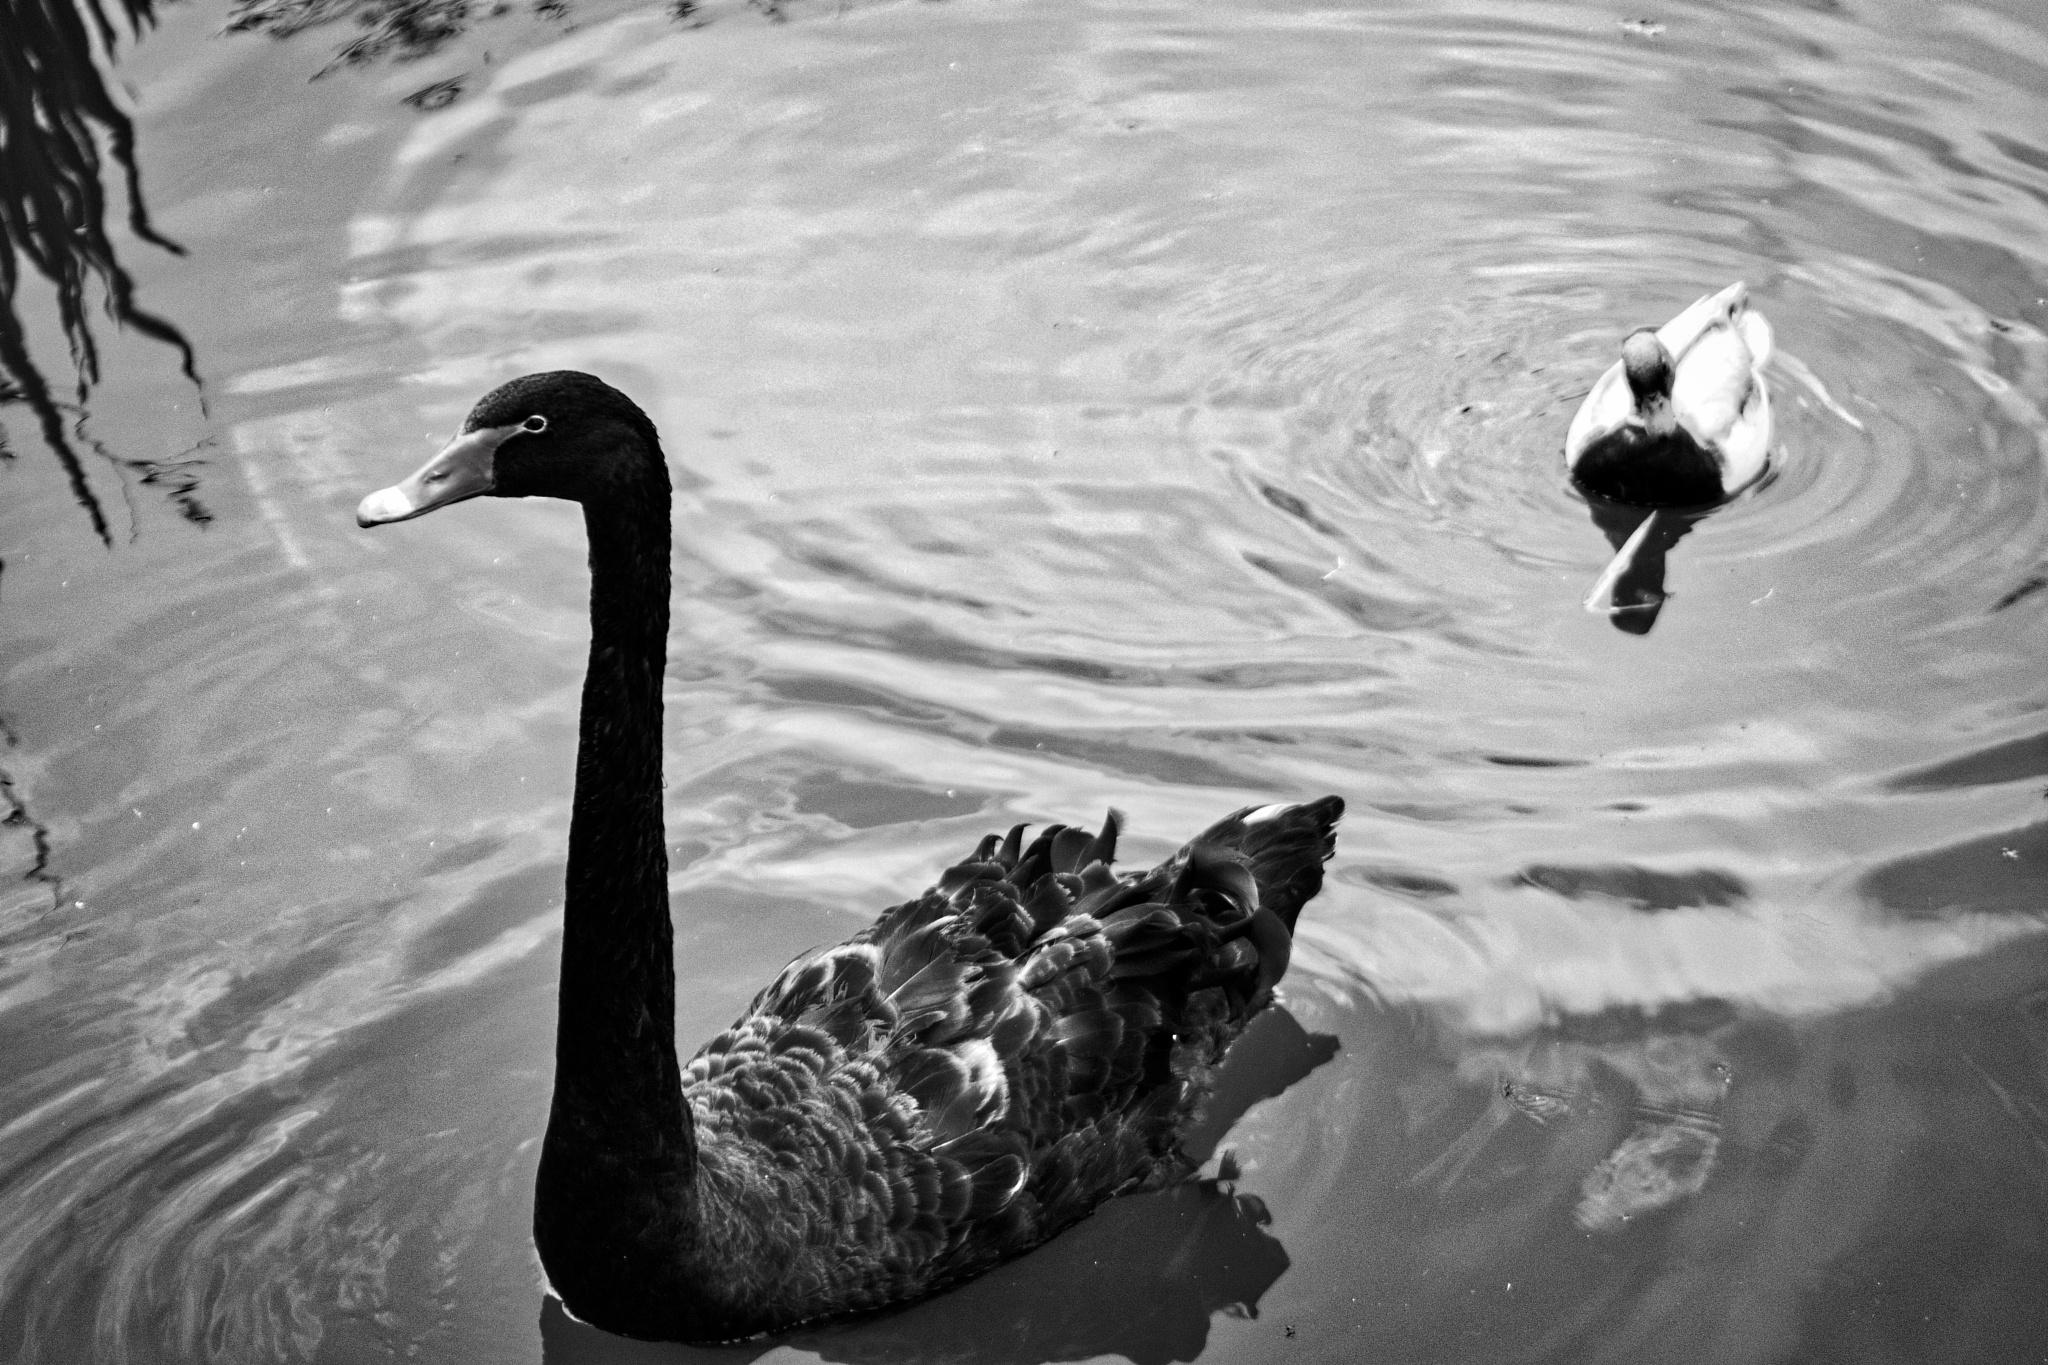 Follow the Leader  by Wayne L. Talbot